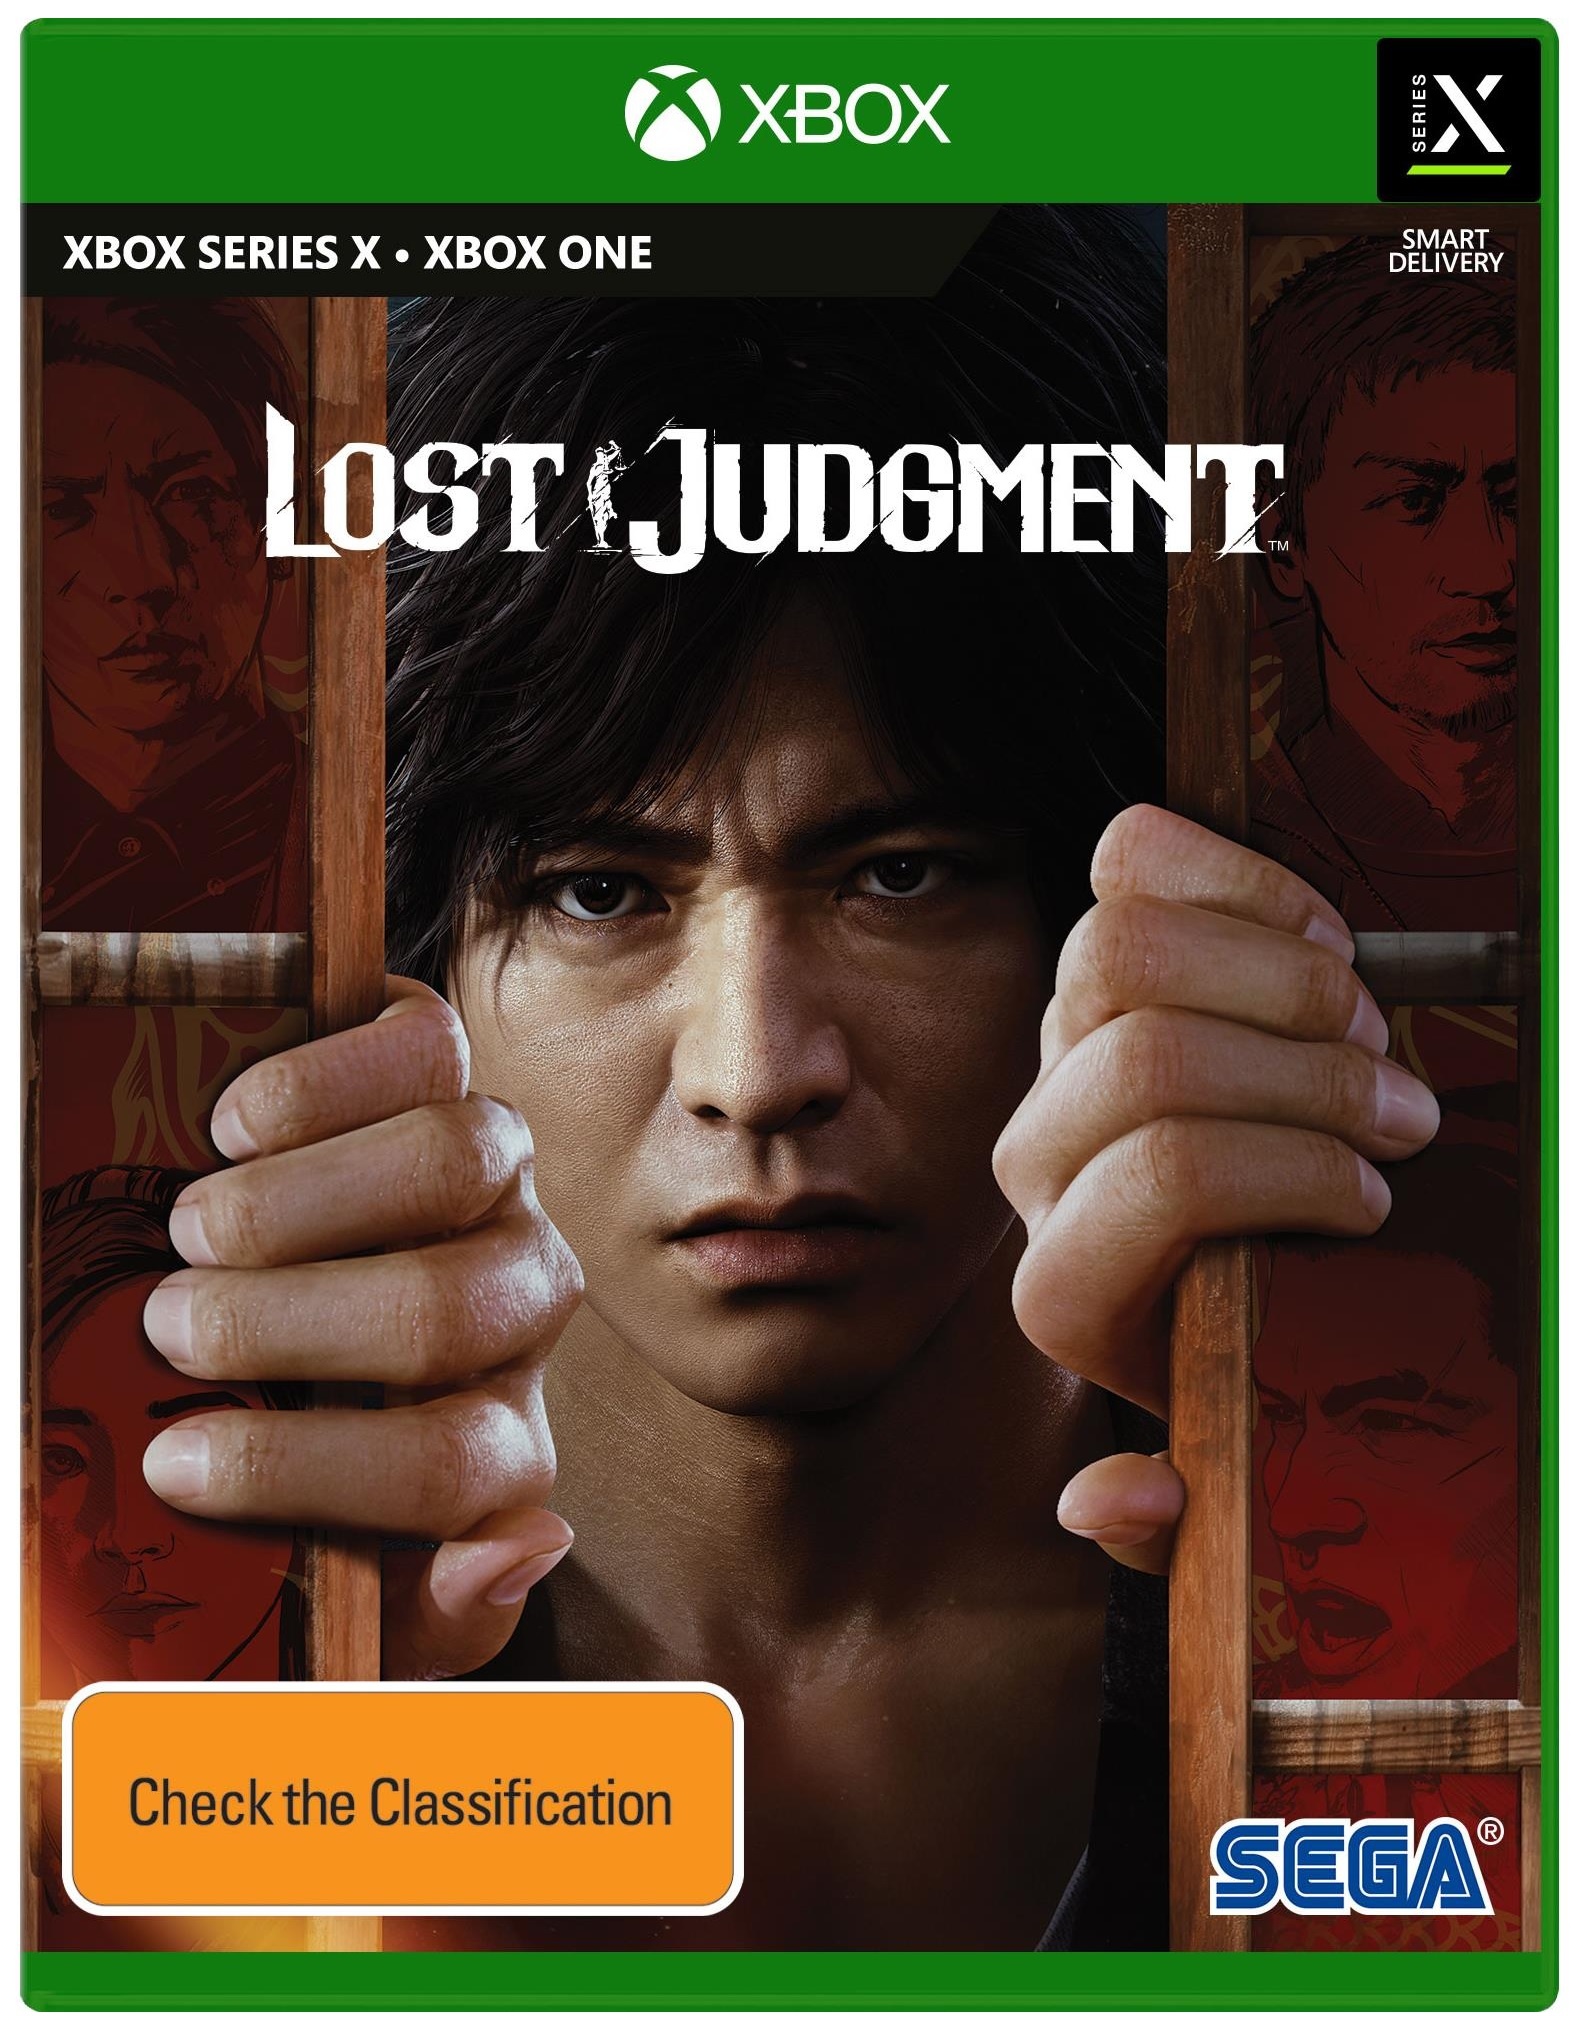 Sega Lost Judgment Xbox Series X Game